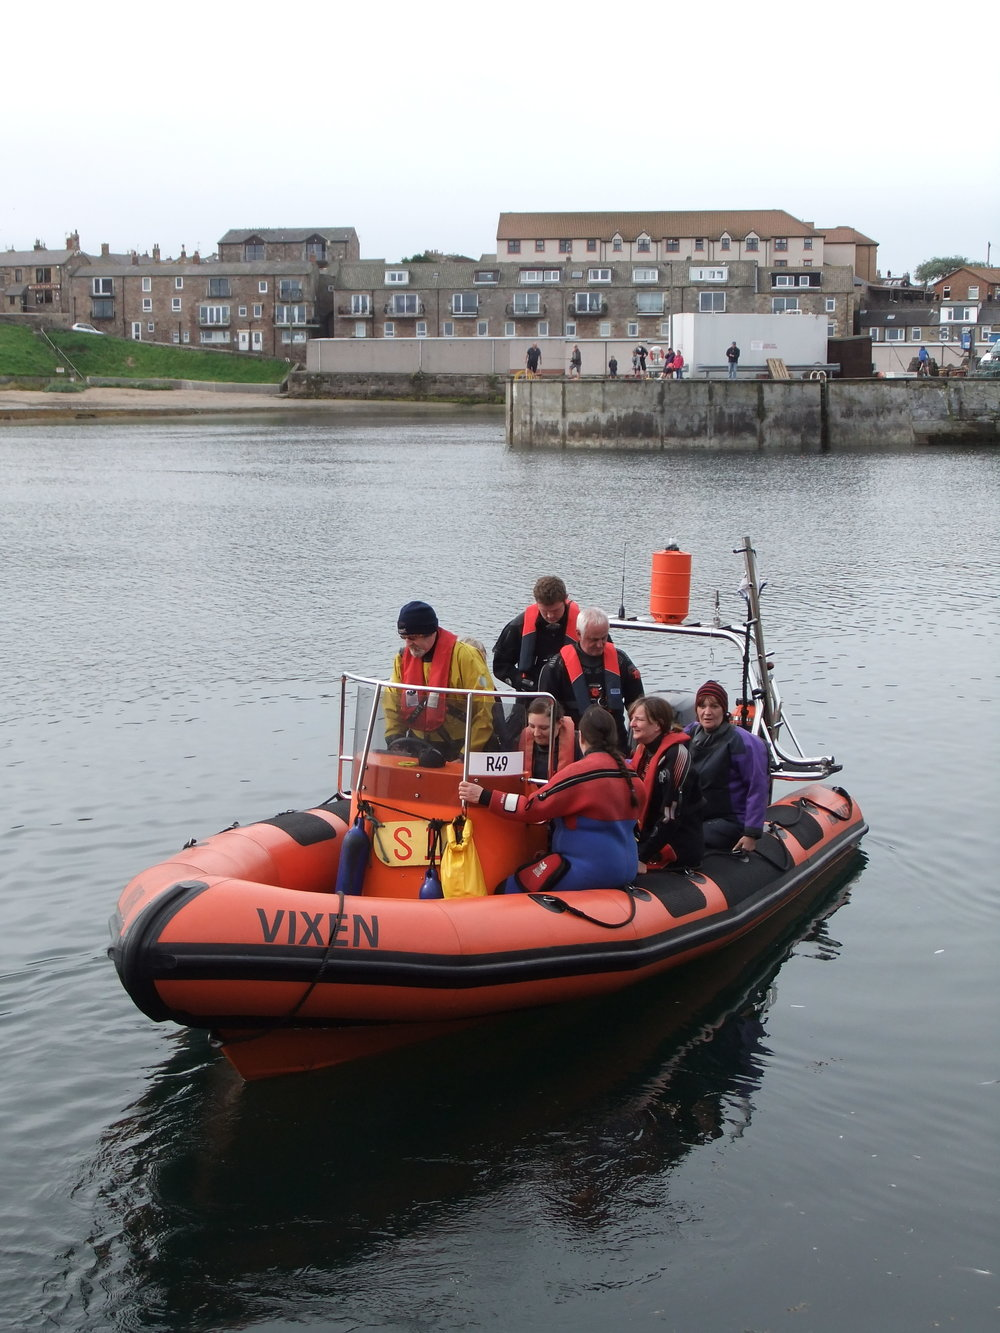 LUEC's rigid inflatable boat.